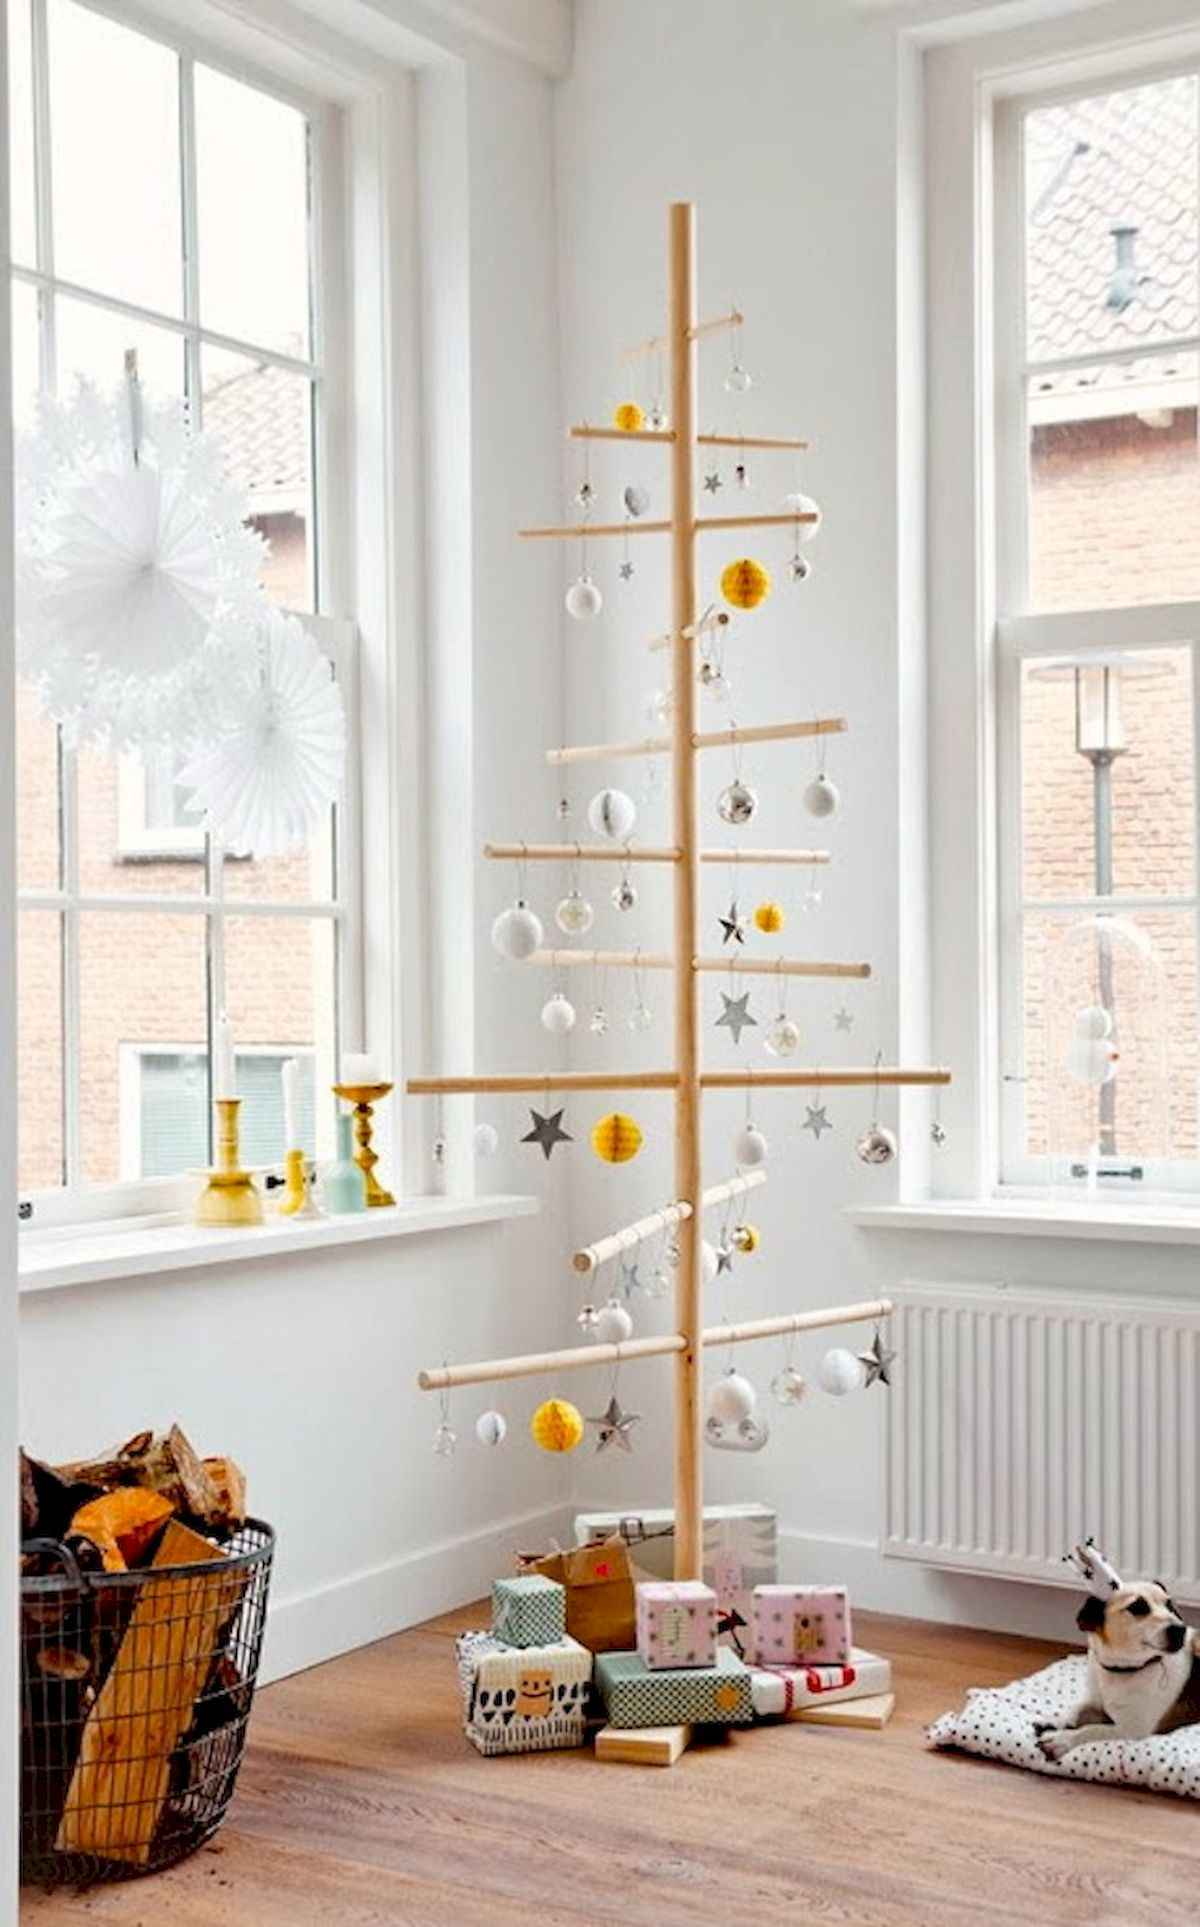 50 diy christmas decorations ideas (31)